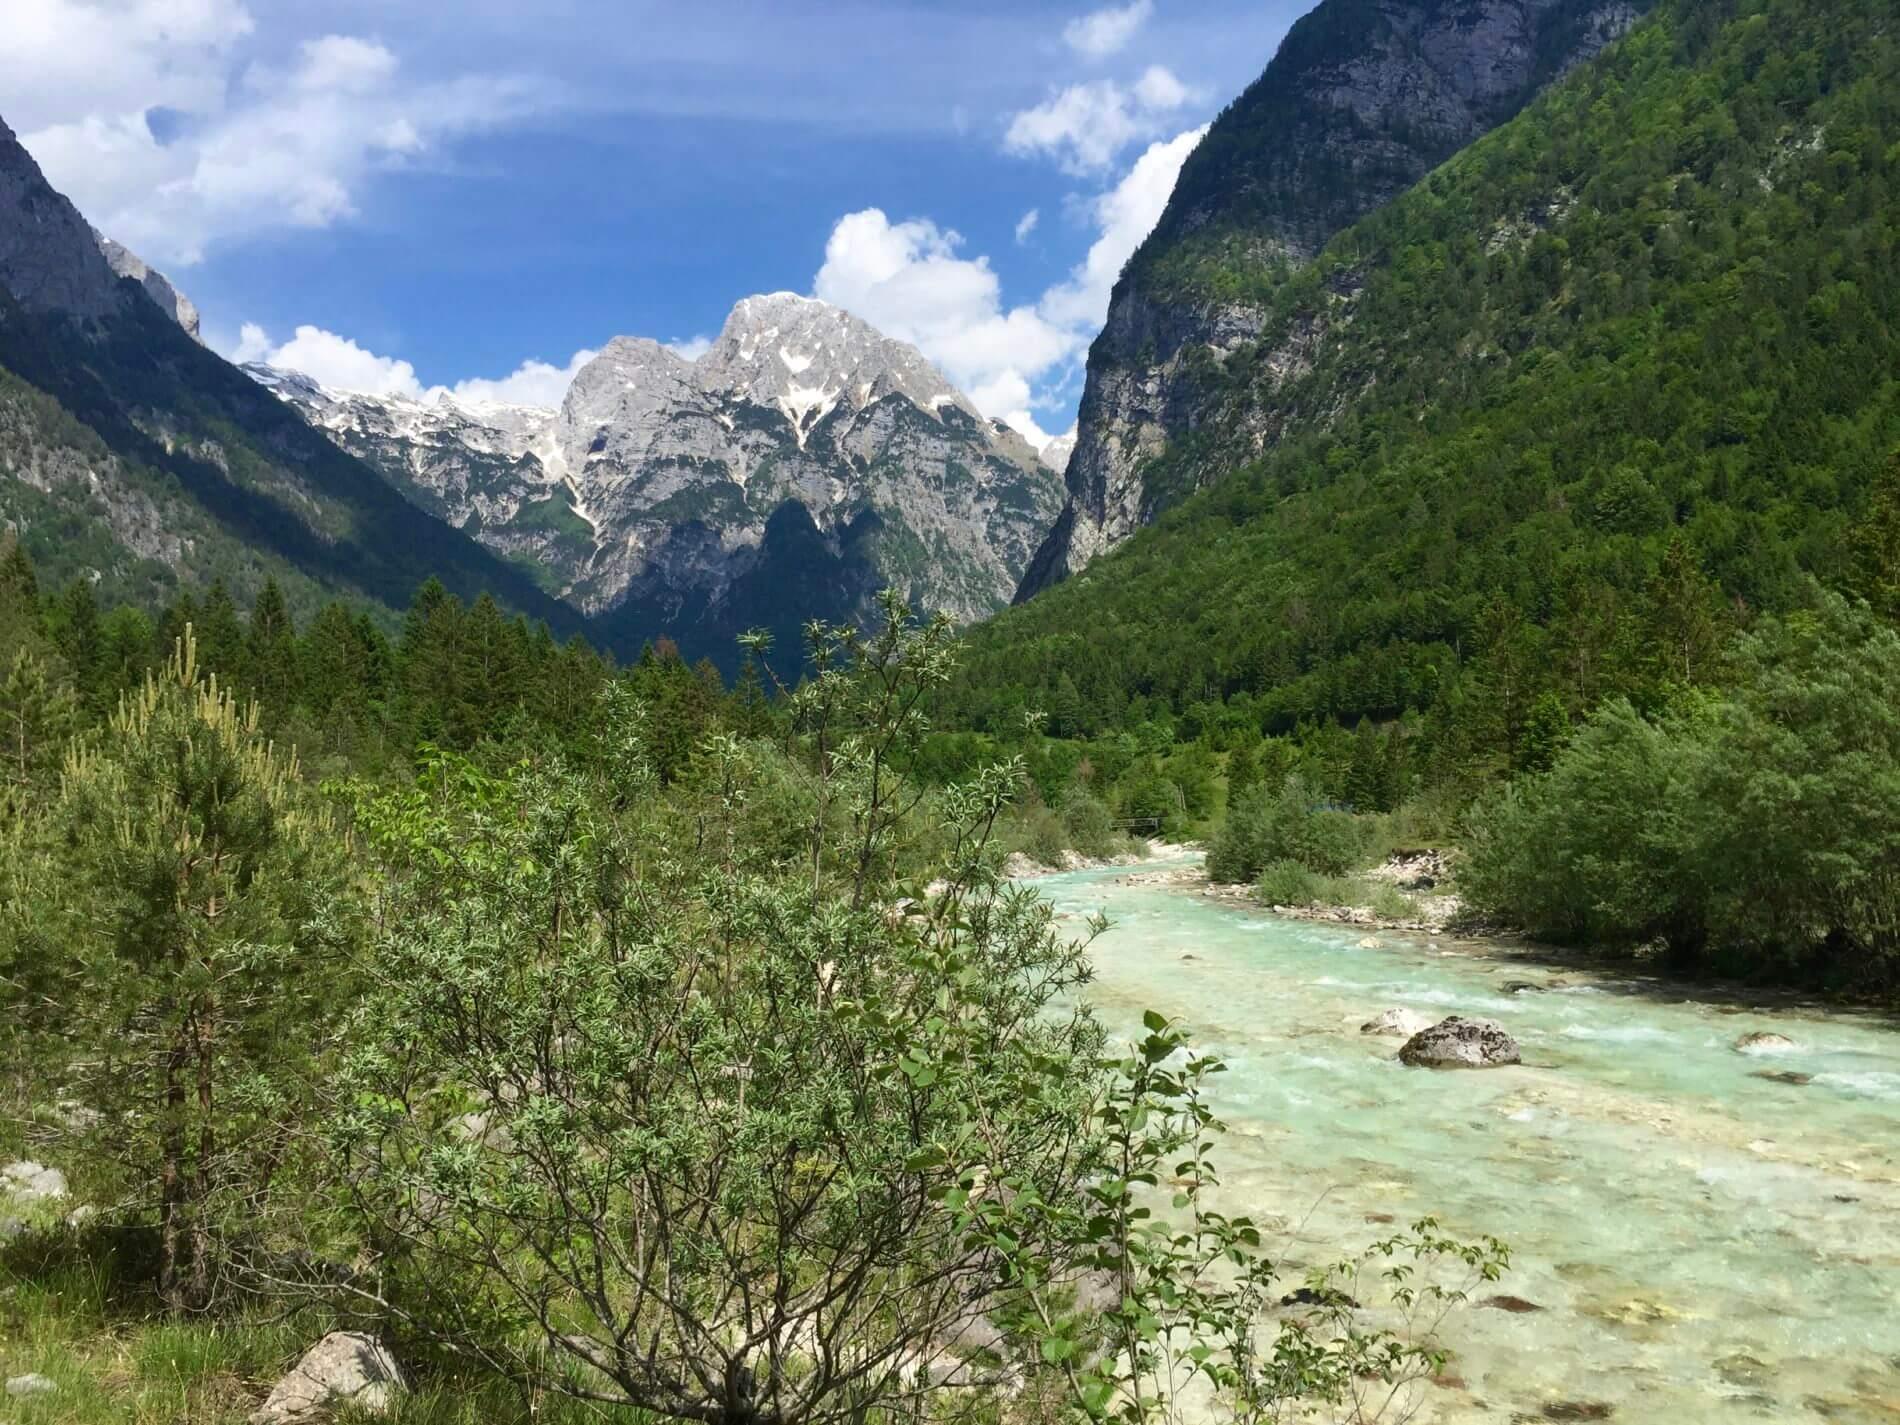 AAT_Alpe-Adria-Trail_Soča und Berge